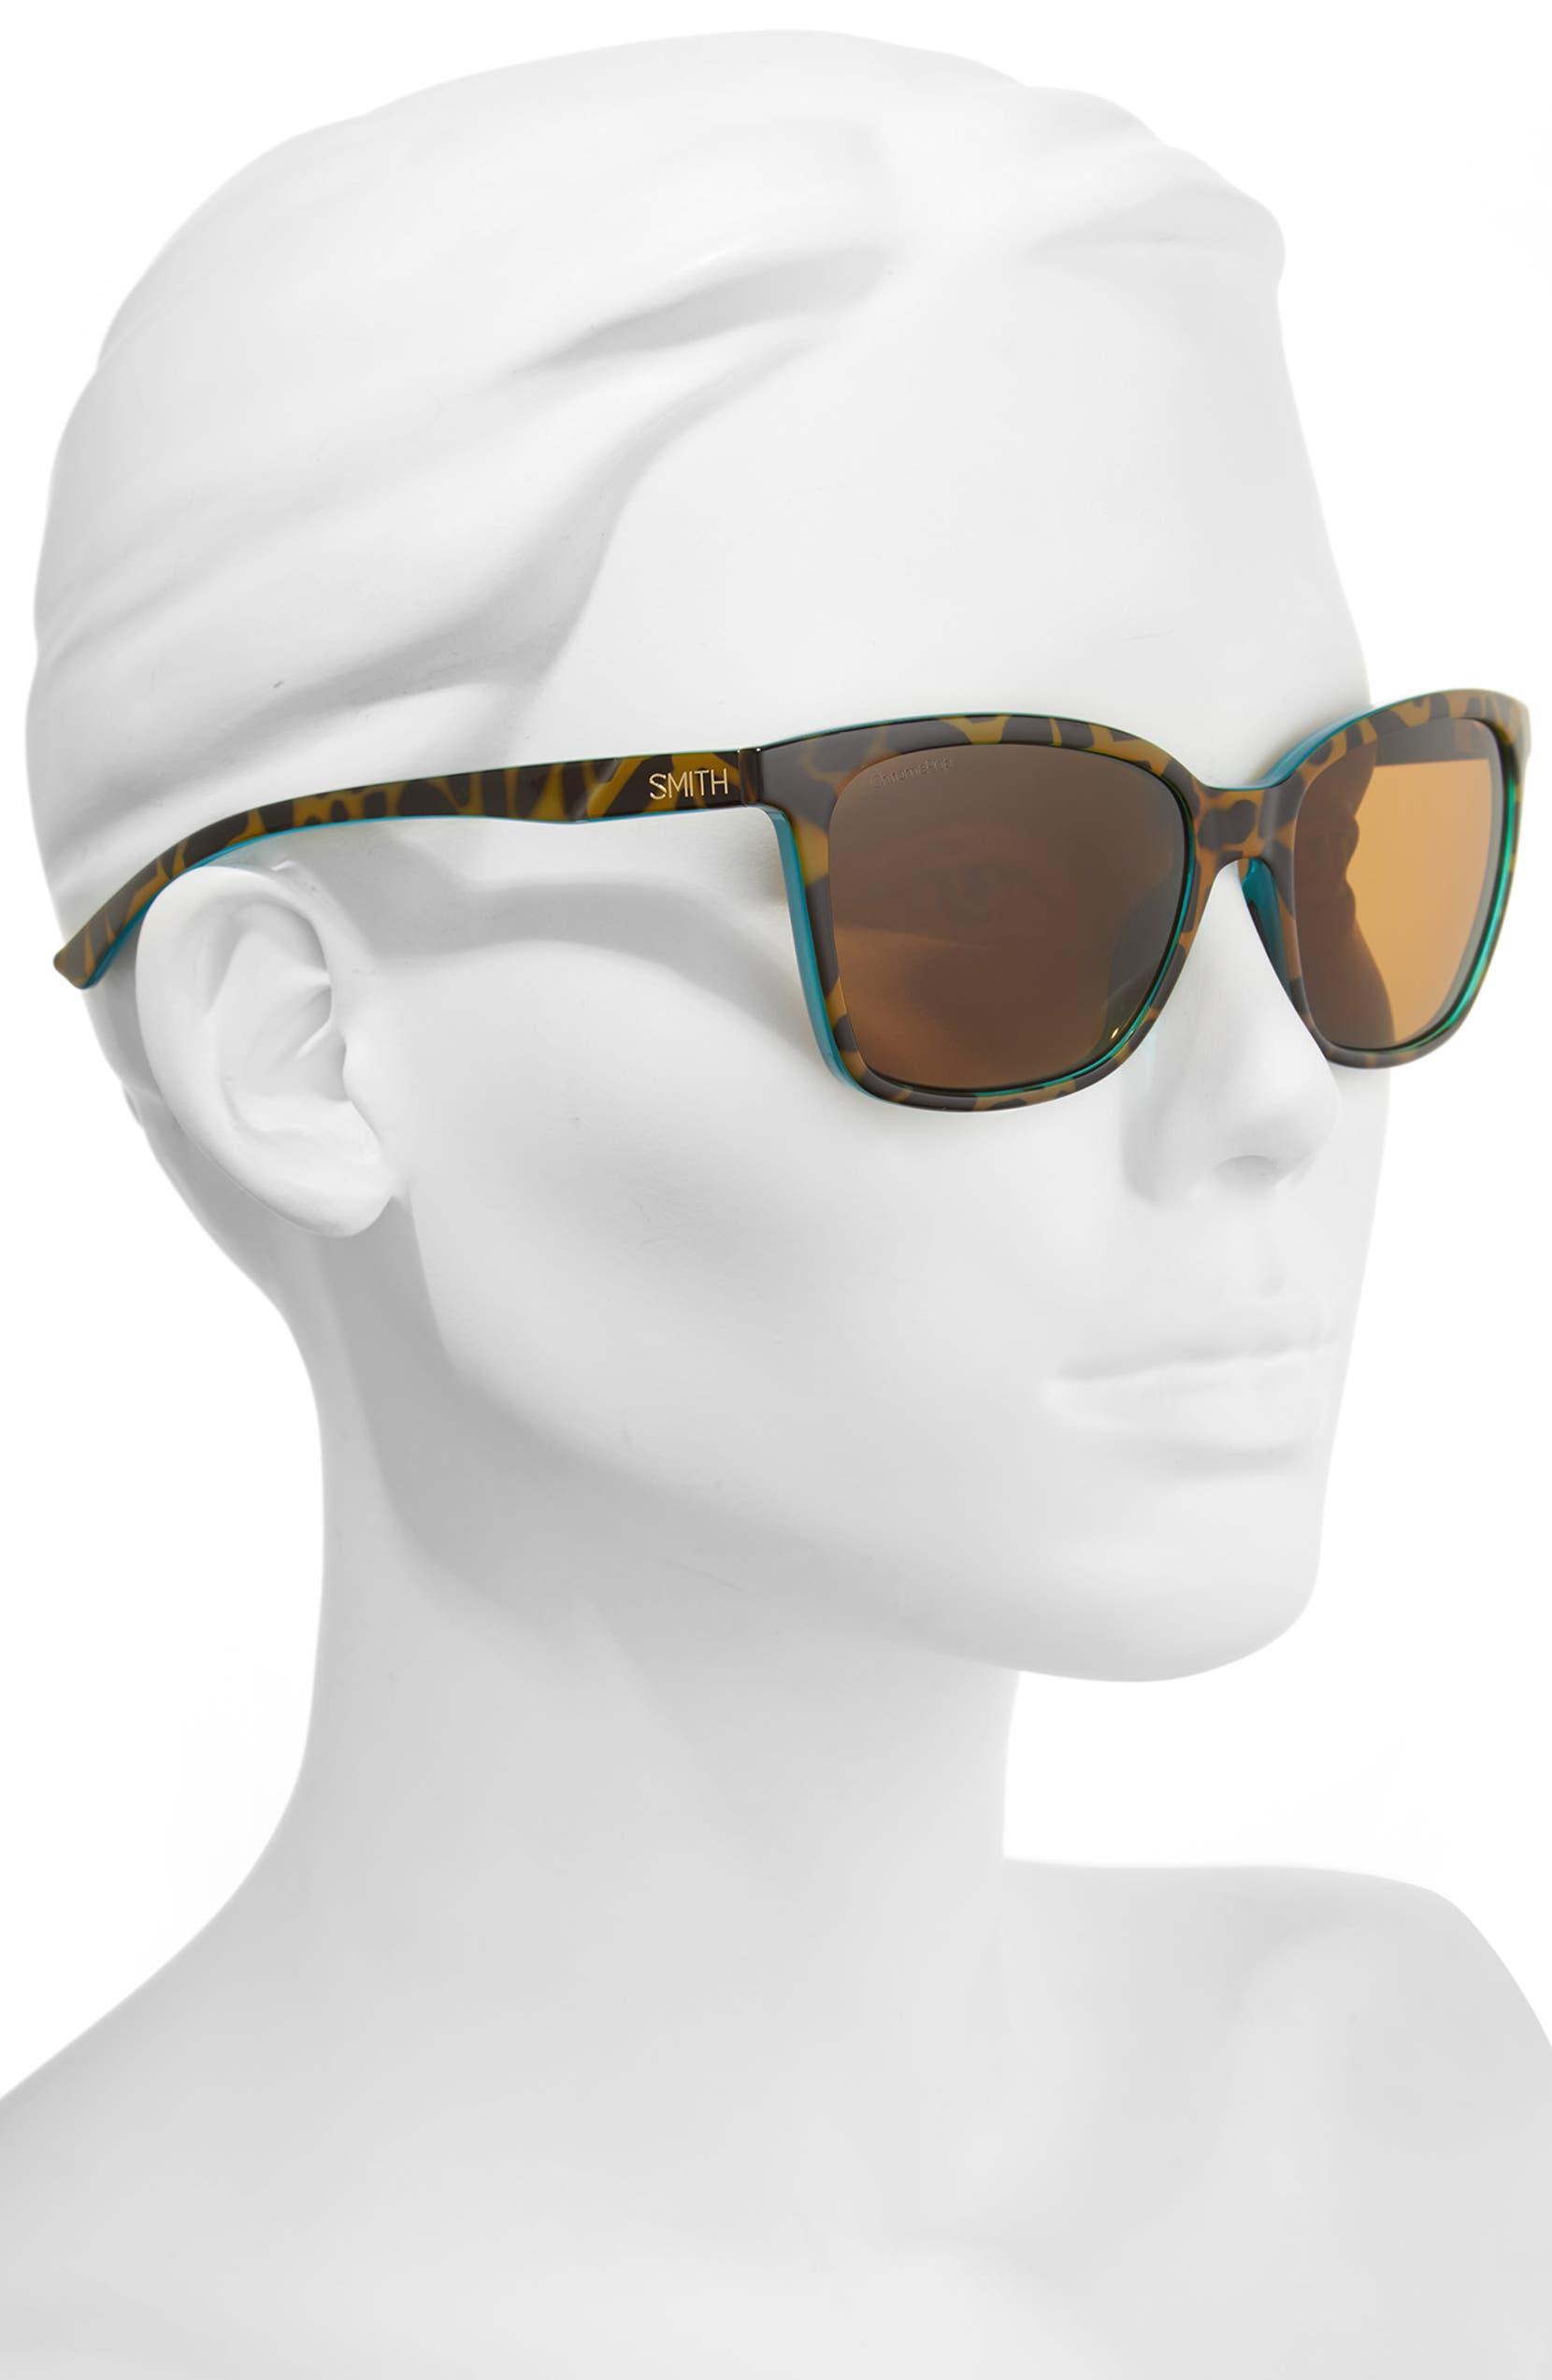 72adced237 Smith  Colette  55mm ChromaPop™ Polarized Sunglasses